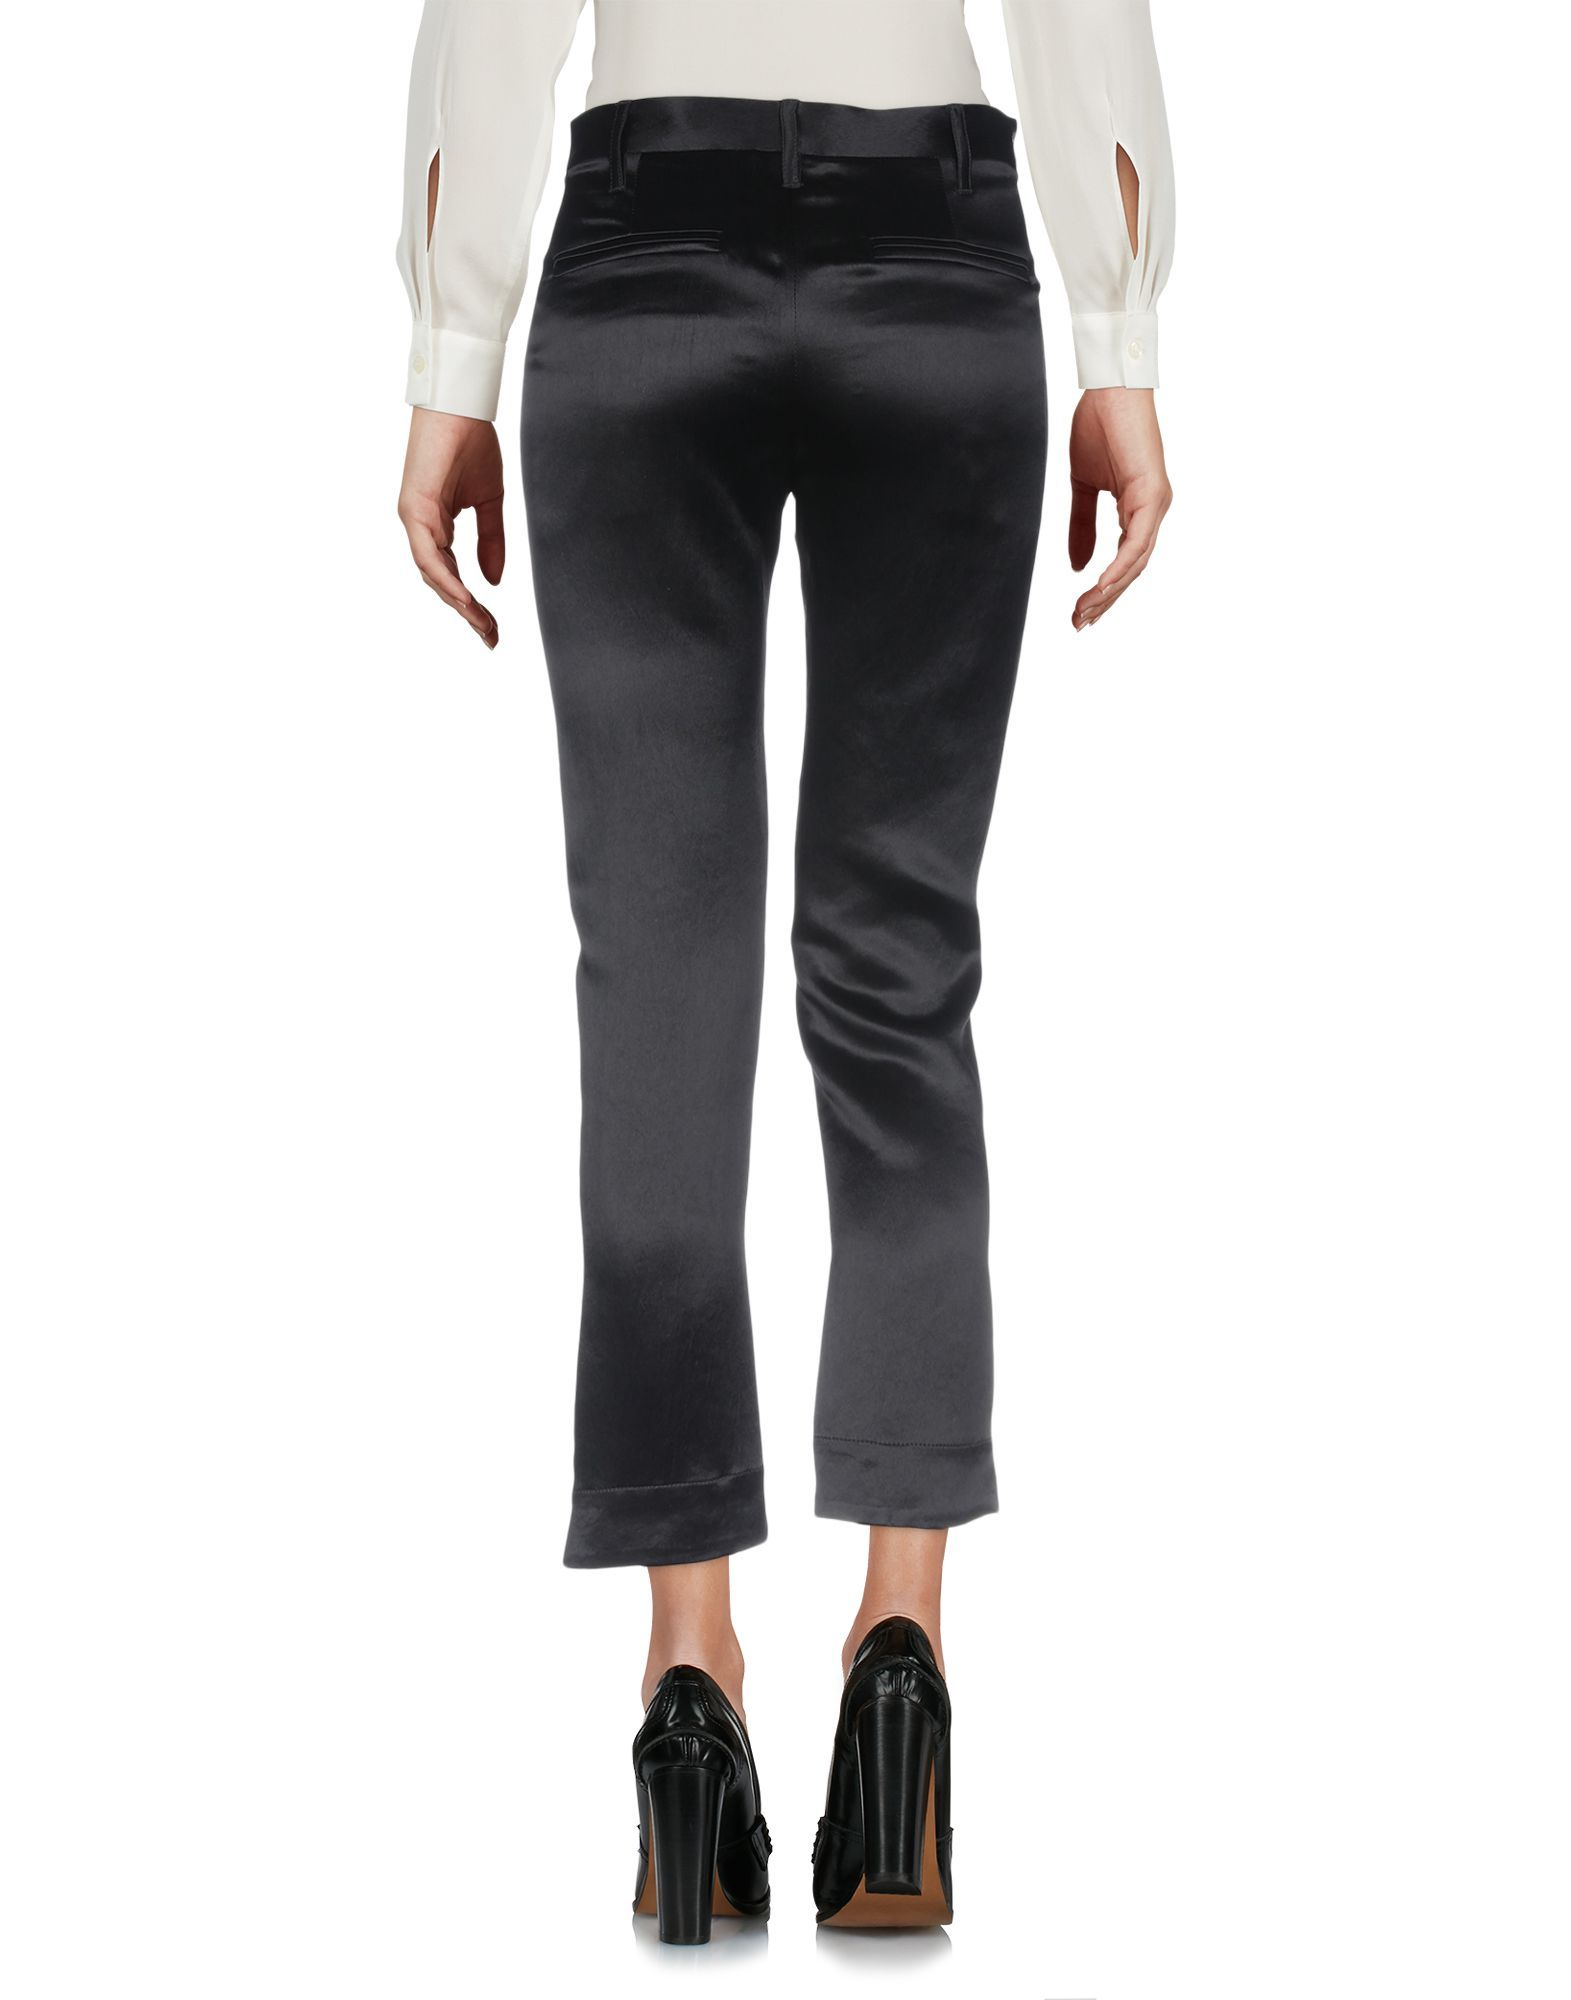 Ann Demeulemeester Black Satin Trousers